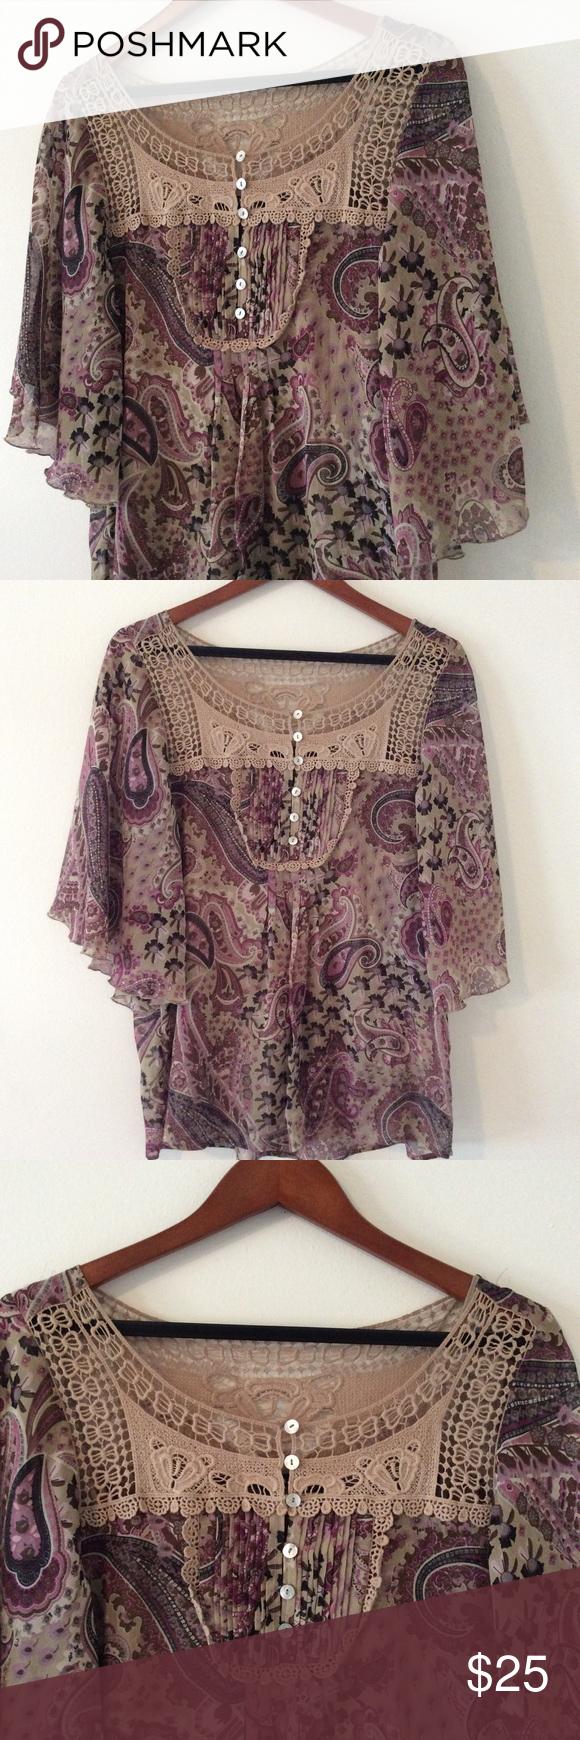 Flirty Airy Paisley Print Boho Blouse 👚 M So much beauty in one blouse. Dolman sleeves, Paisley Print, crochet neck, accordion pleats! Size medium. Daniel Rainn Tops